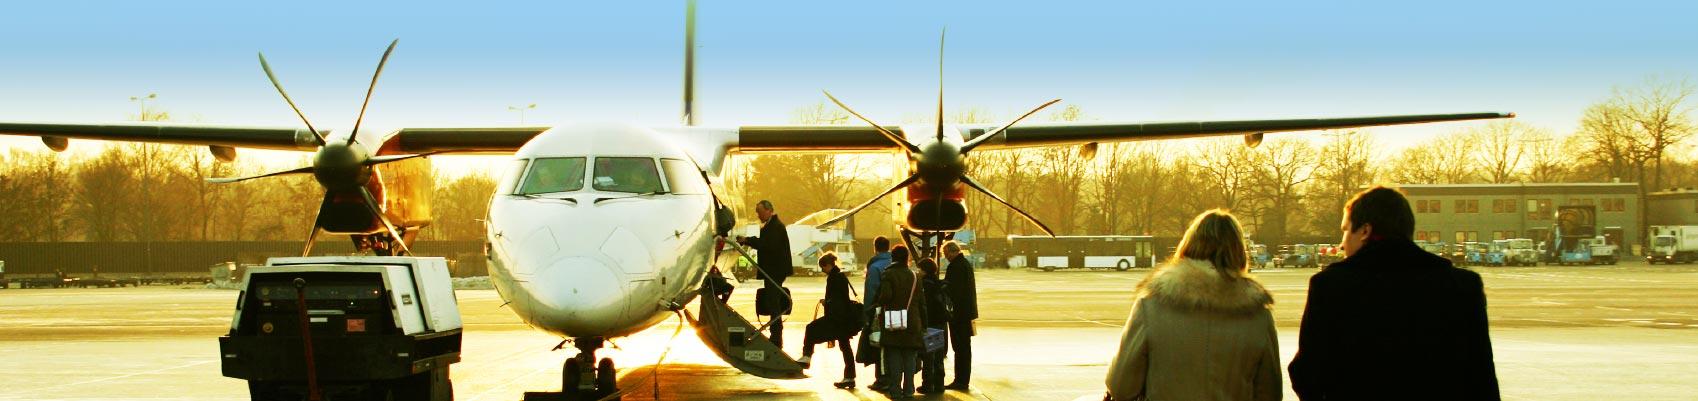 jetstream people background 3